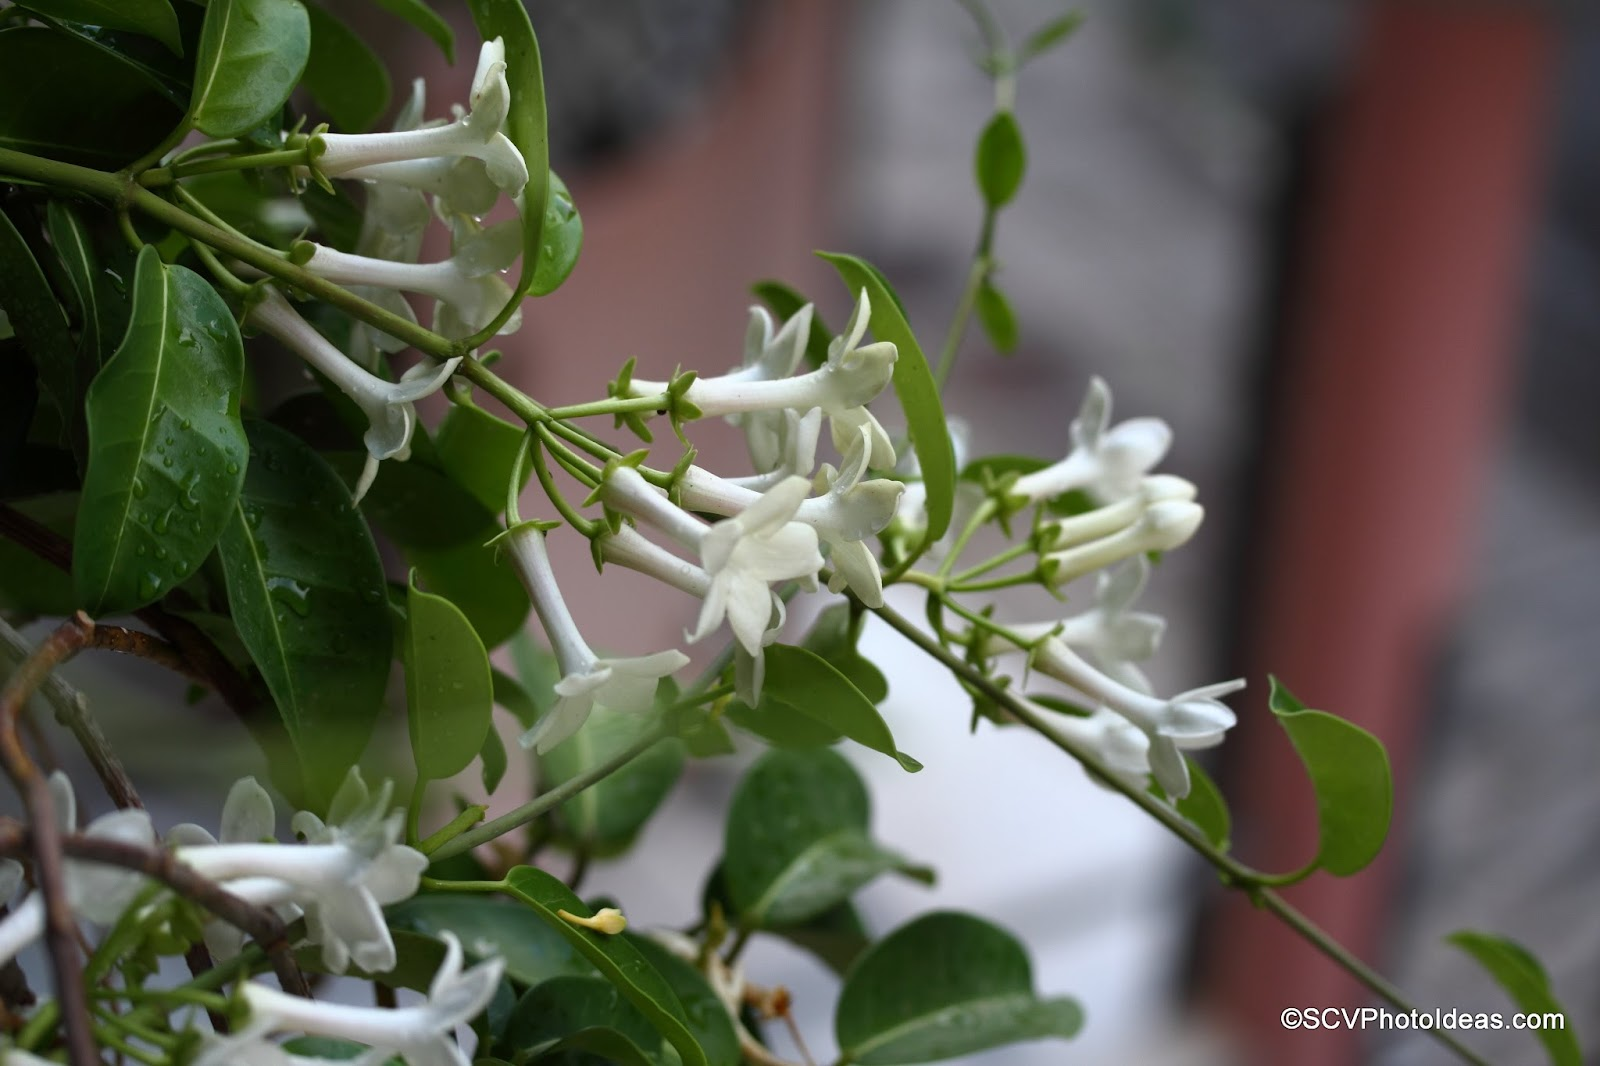 Stephanotis floribunda (Madagascar jasmine) showered flower bunches